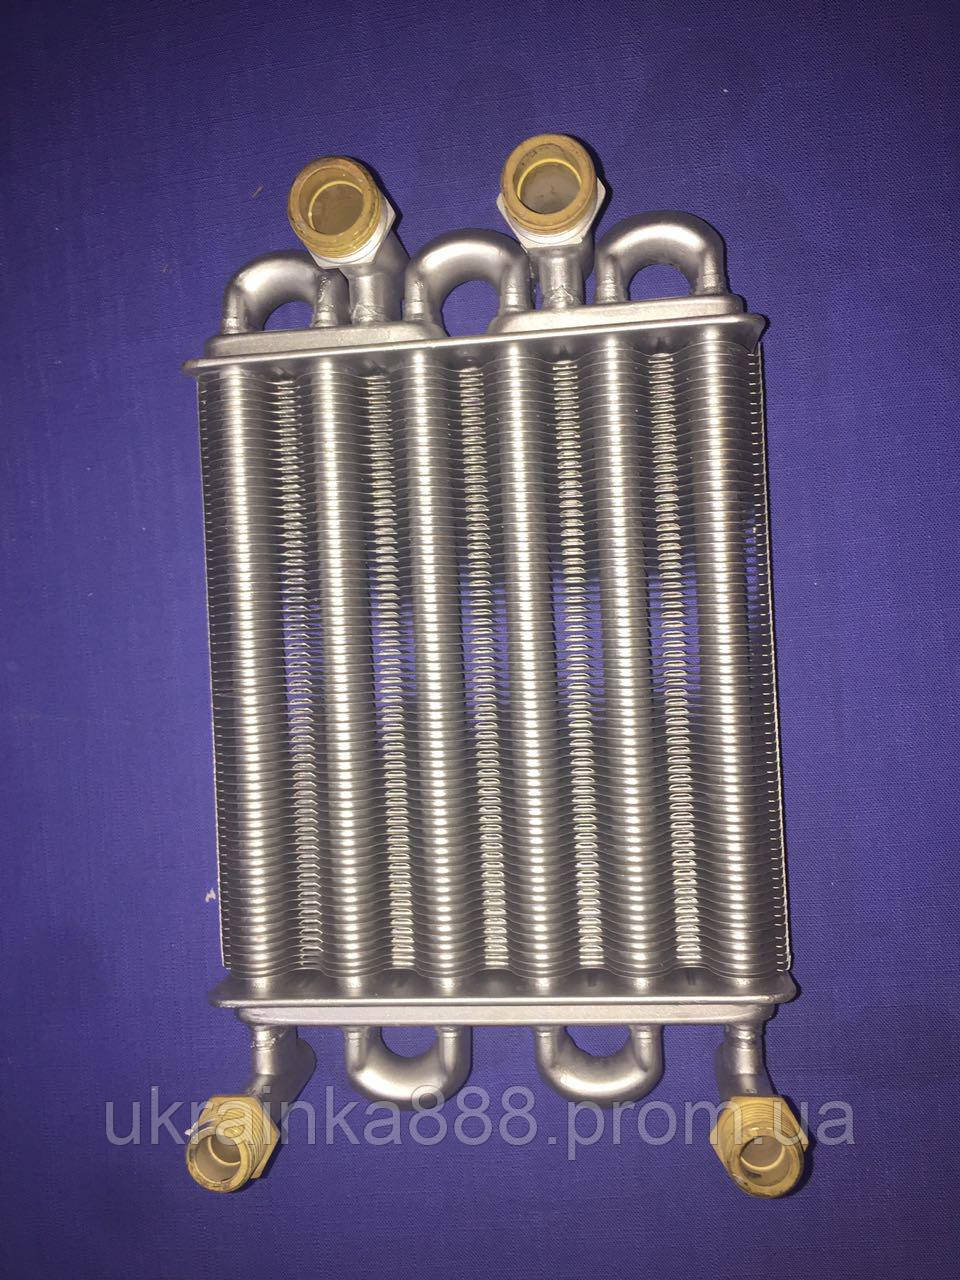 Теплообменник битермический Solly Stanbart H 18 Оригинал. (резьба) , фото 1